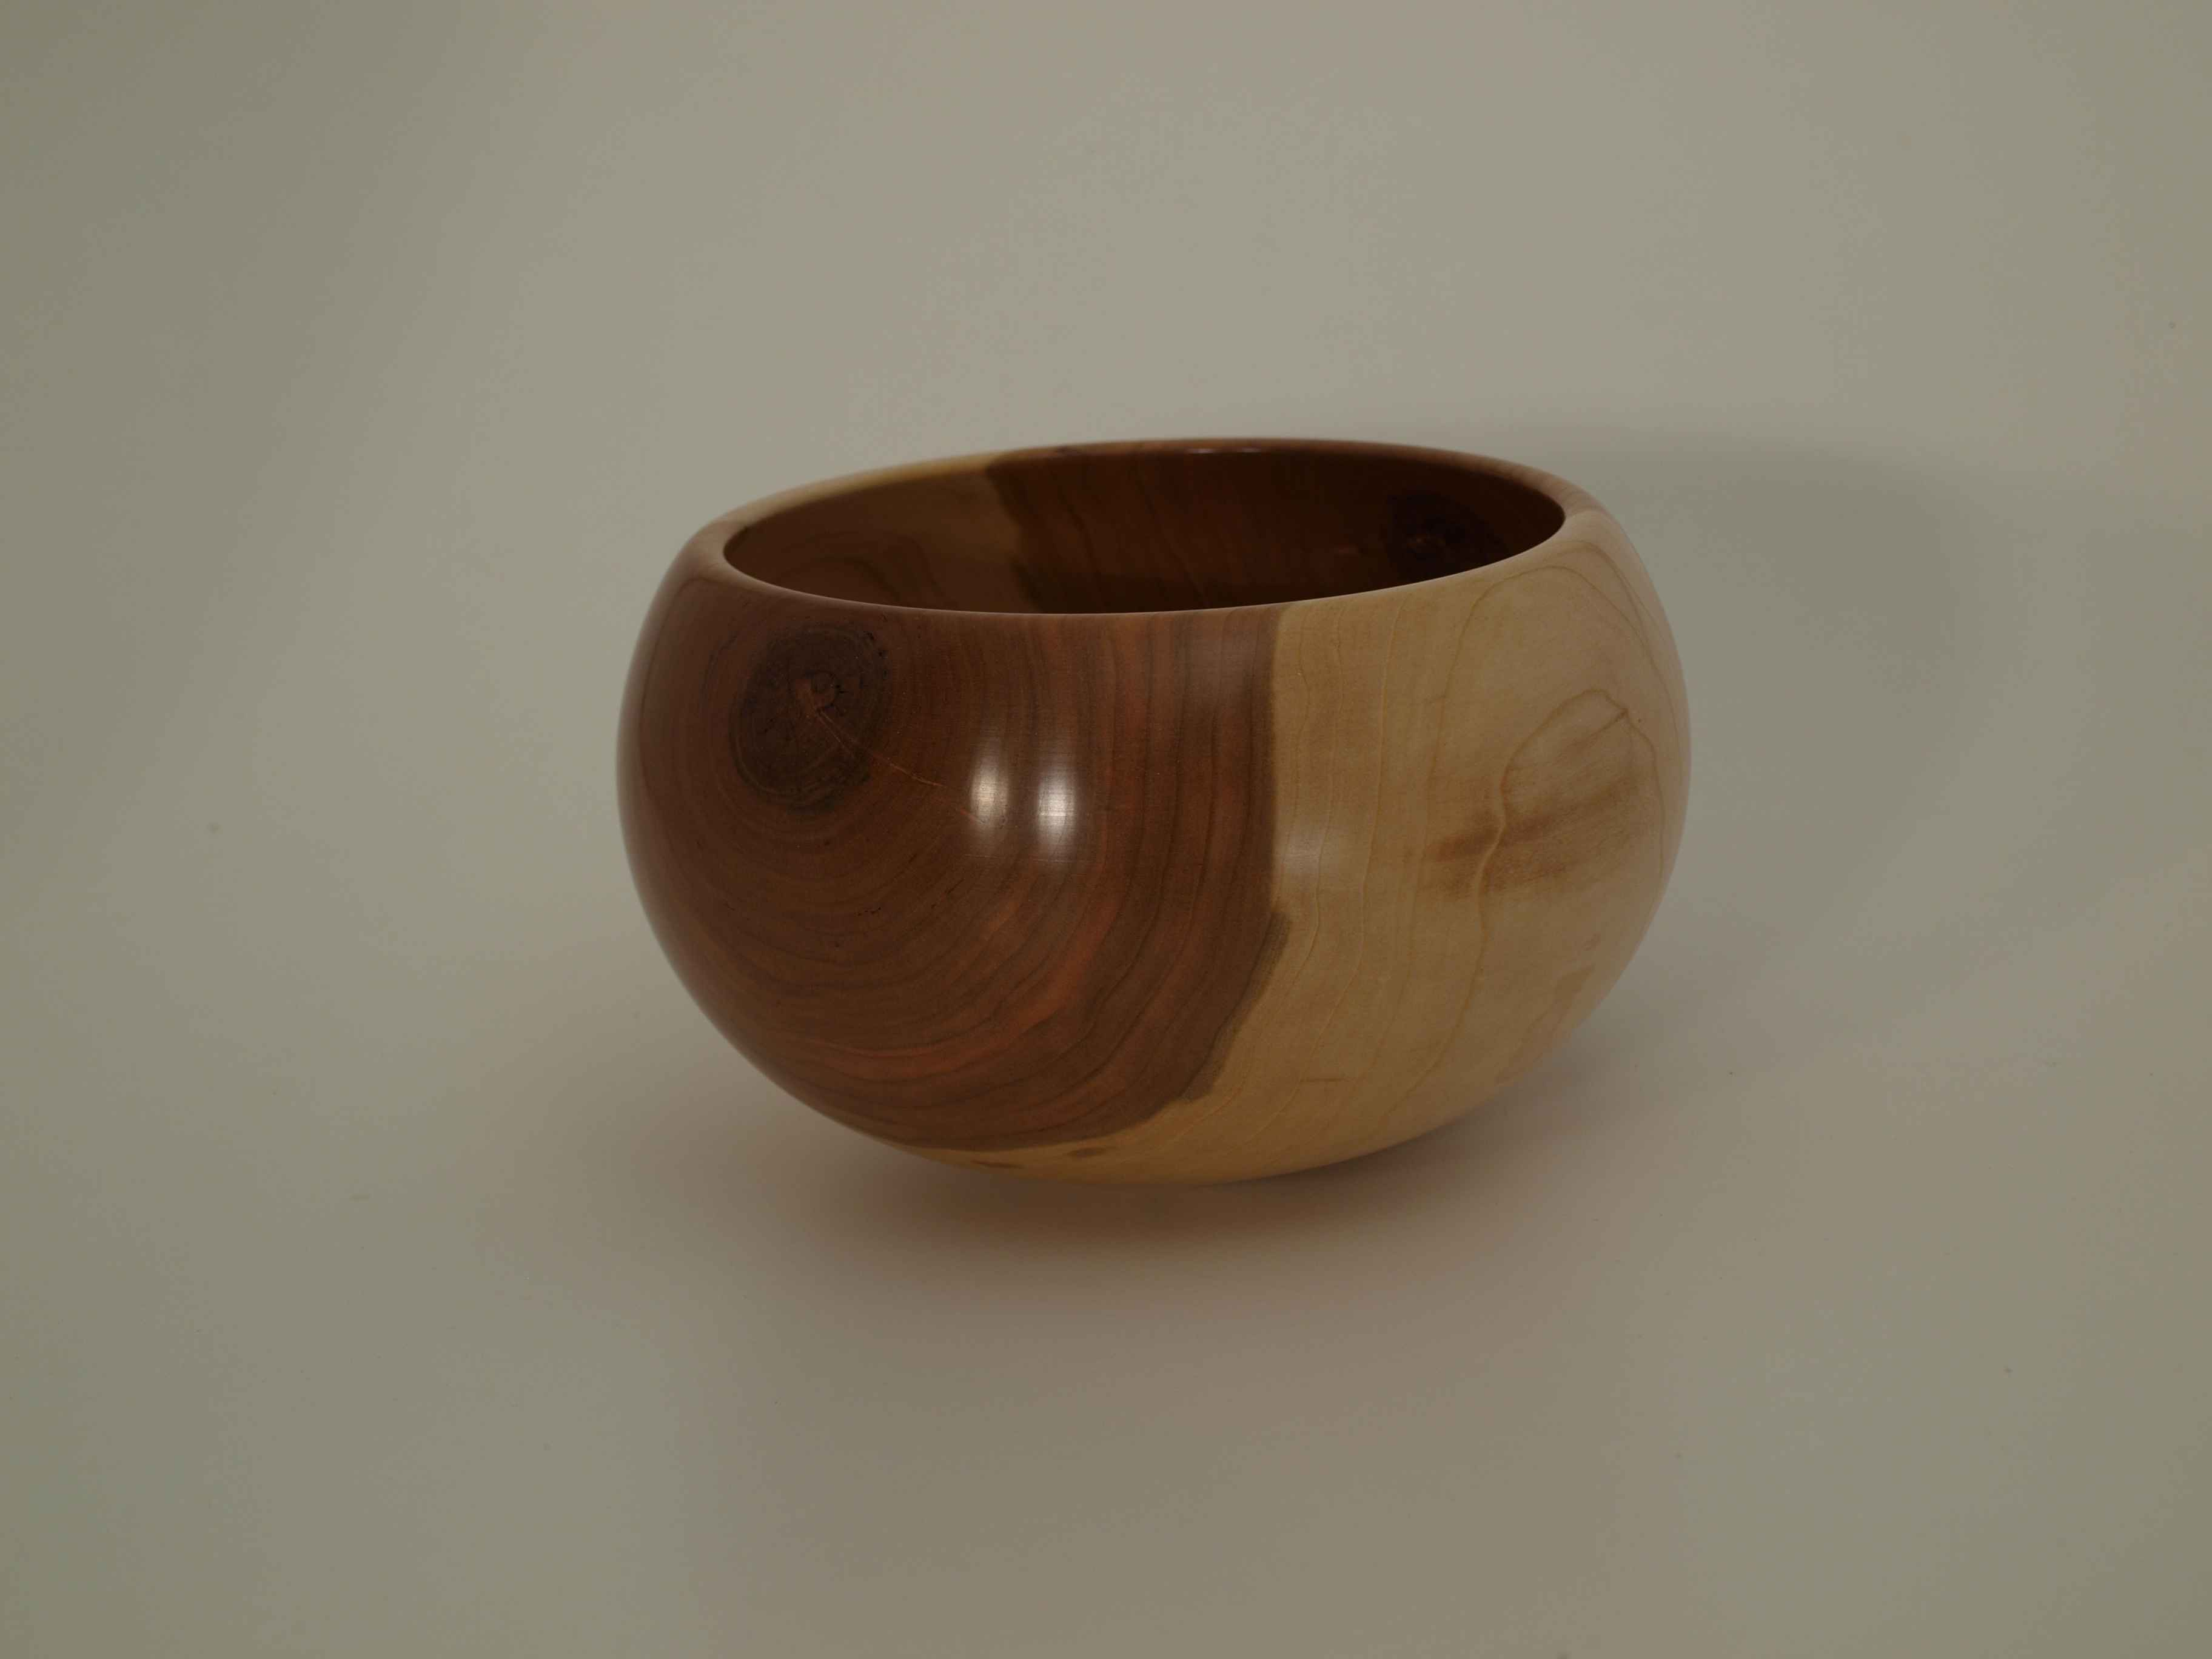 Small Cherry Bowl #2